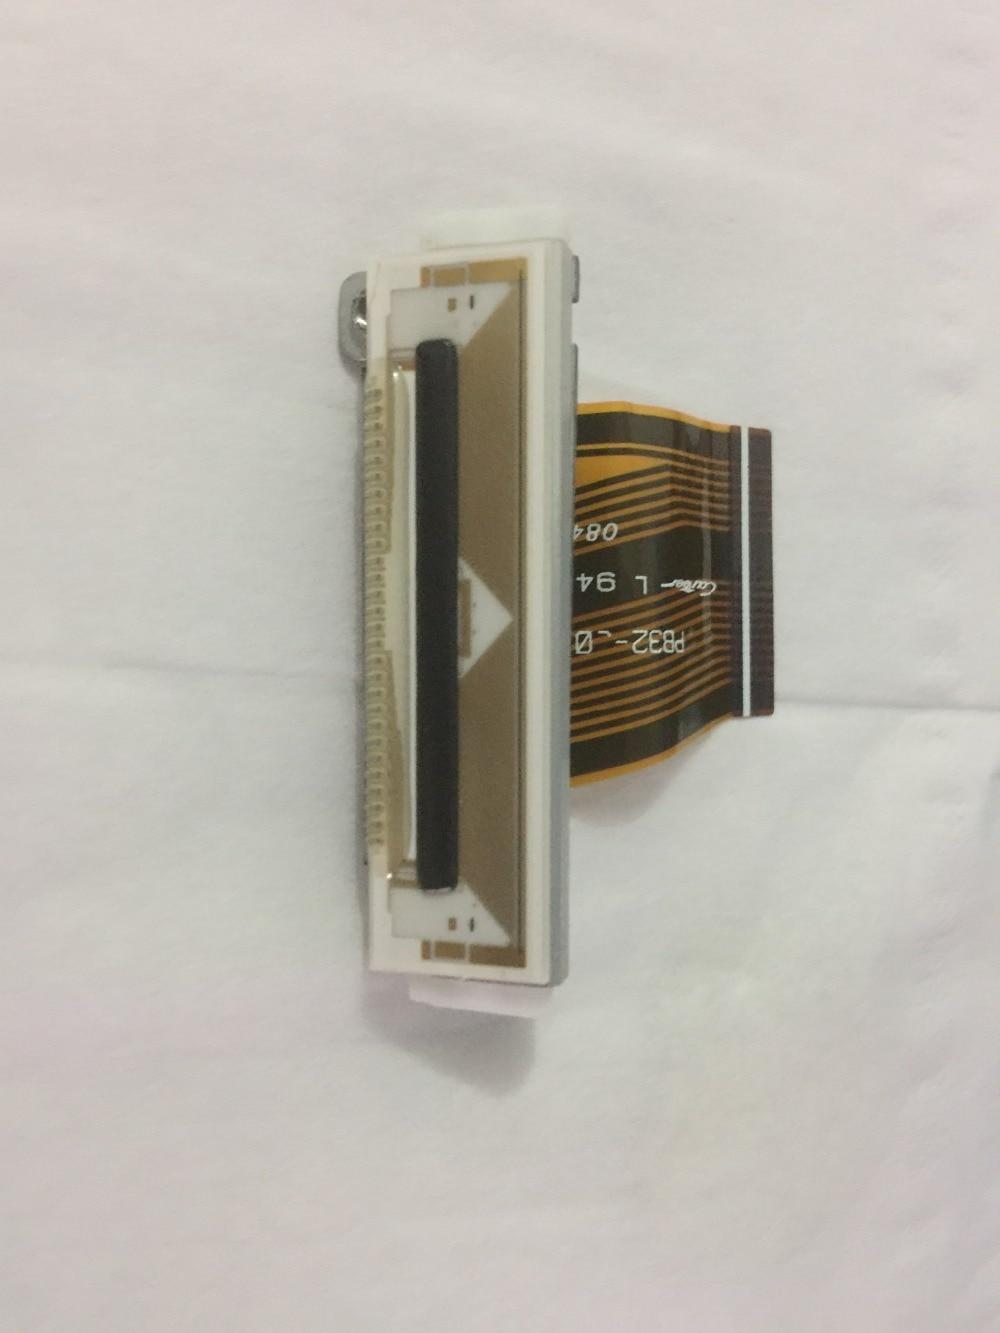 10pcs new original printhead for PB22 Thermal print head for intermec mobileprinter Part number PB22 6011S